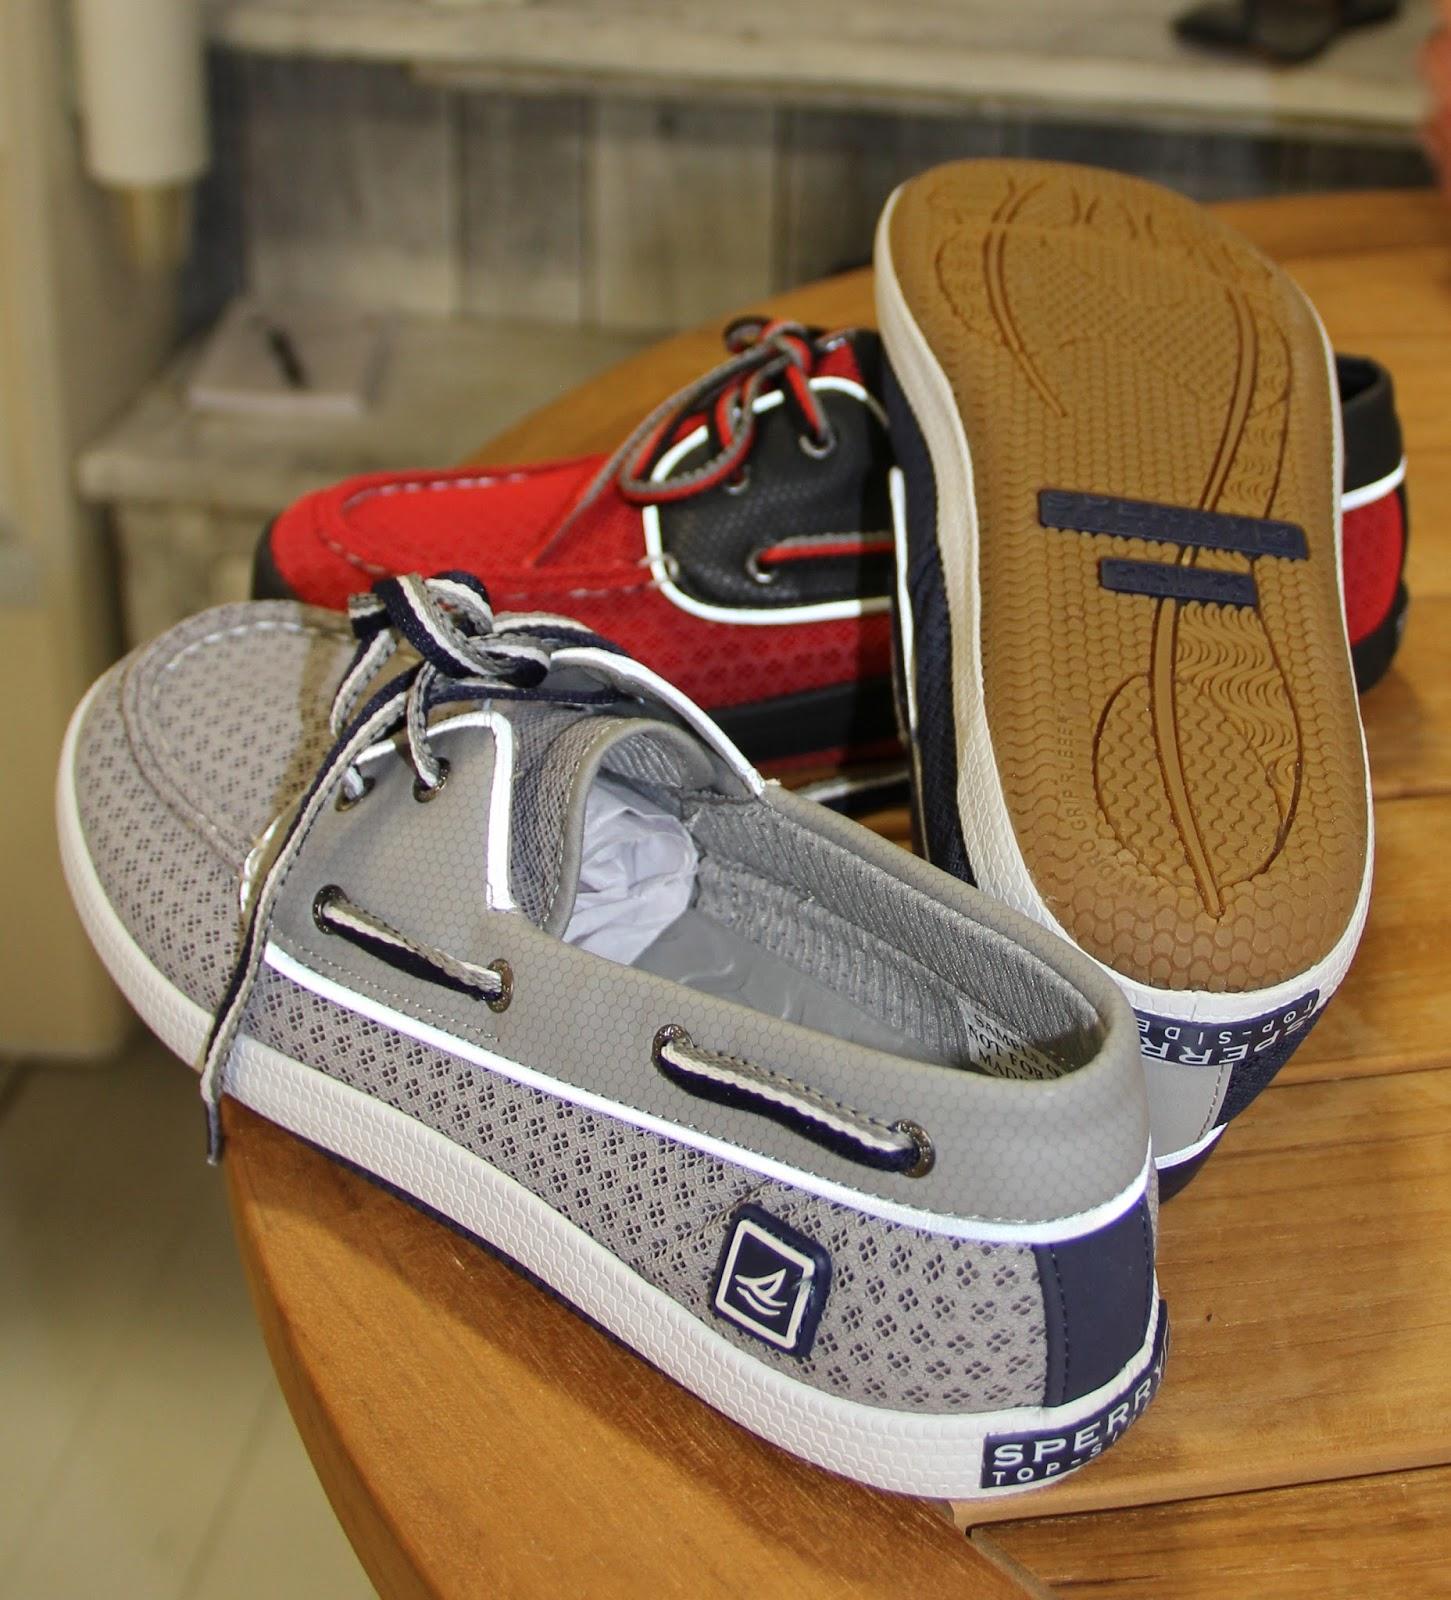 599f365c7f Outdoor Retailer-New Cool Gadgets Gear Apparel Footwear S S 2014 Part 4